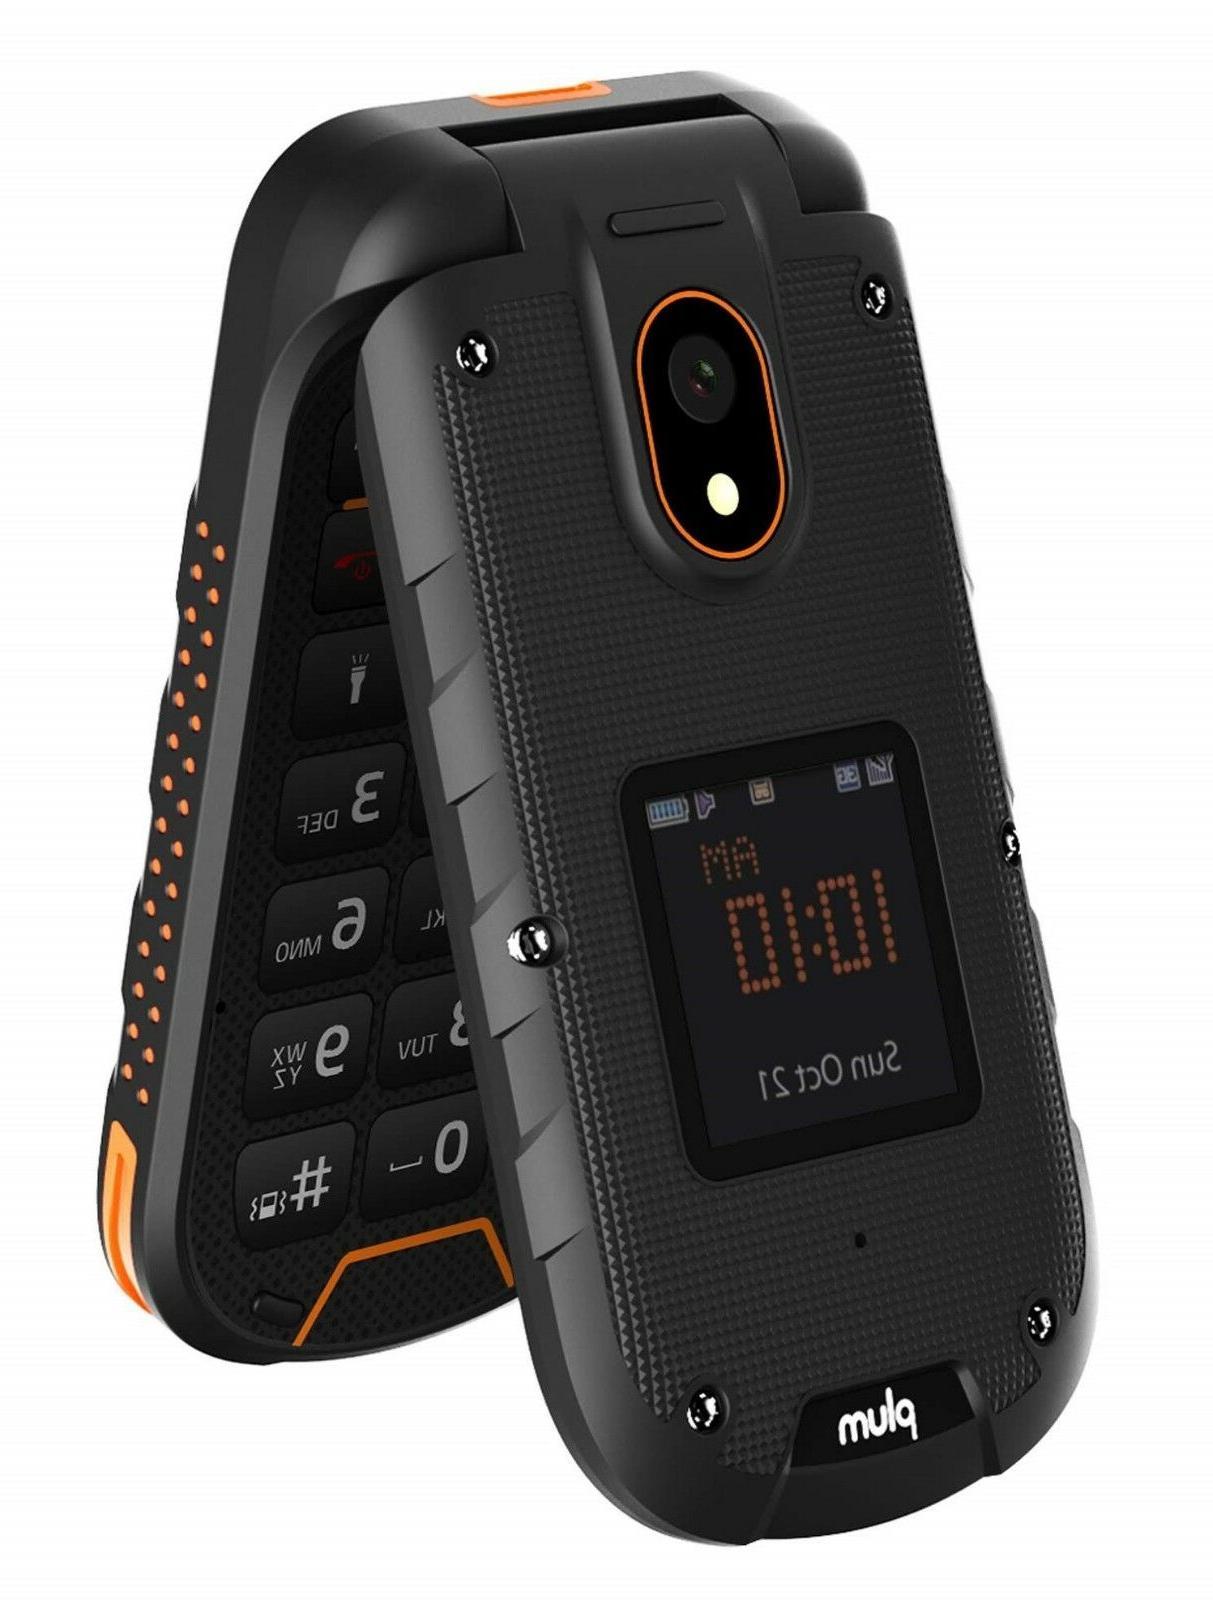 rugged flip phone 3g gsm unlocked water